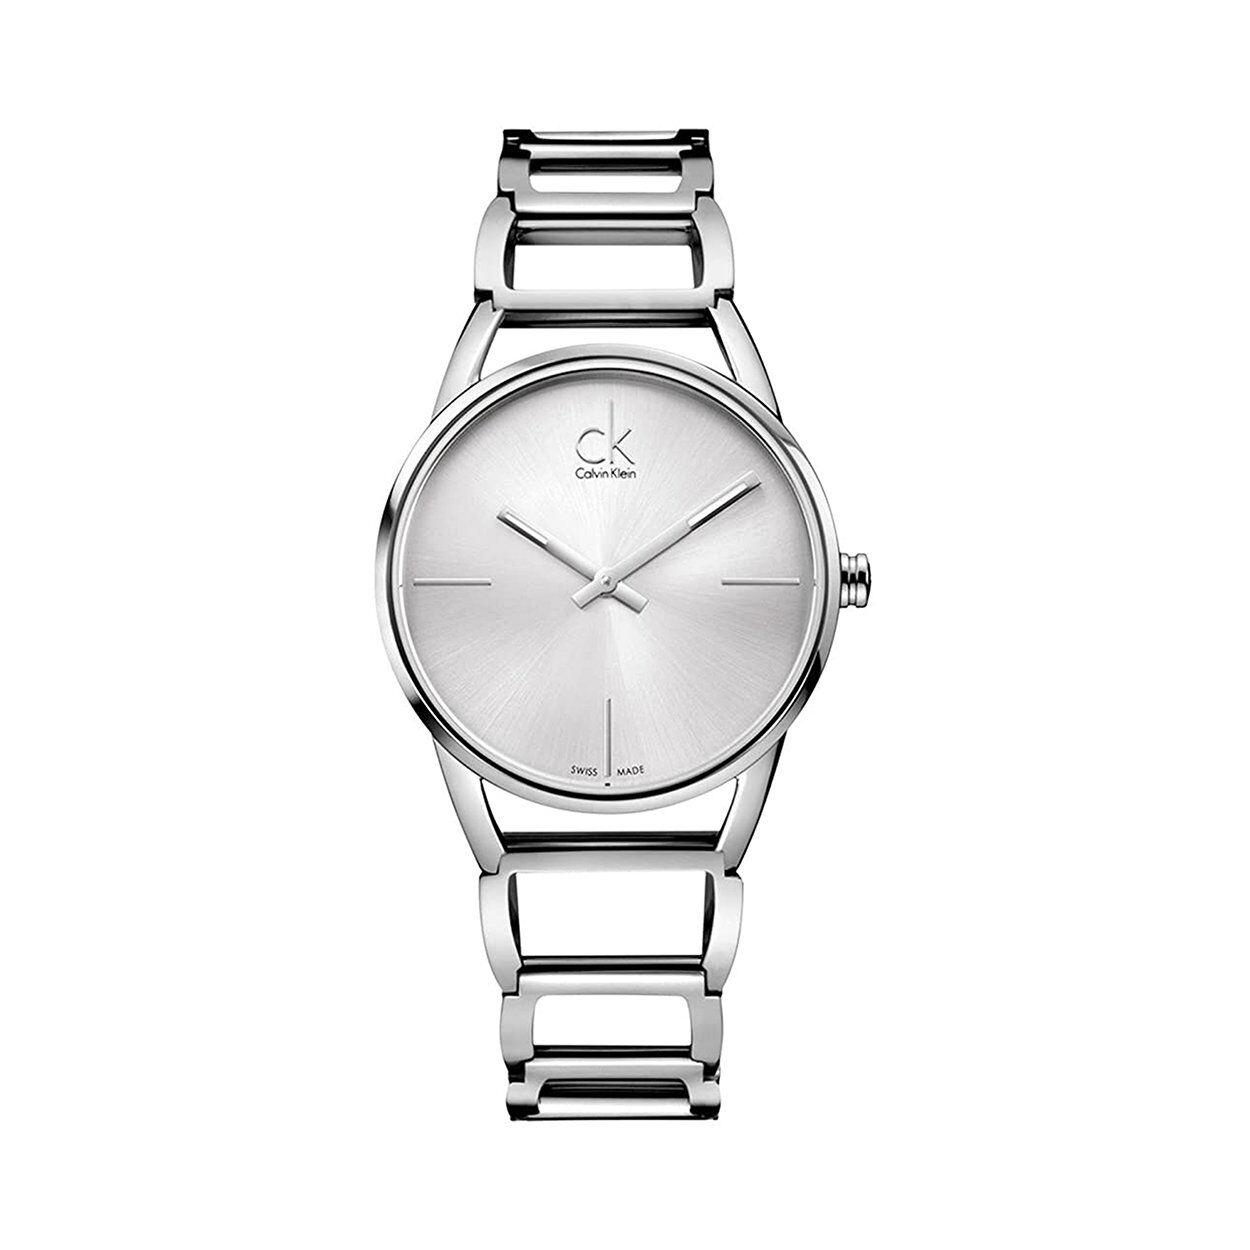 calvin klein orologio da polso donna calvin klein con cinturino in acciaio con quadrante madreperla